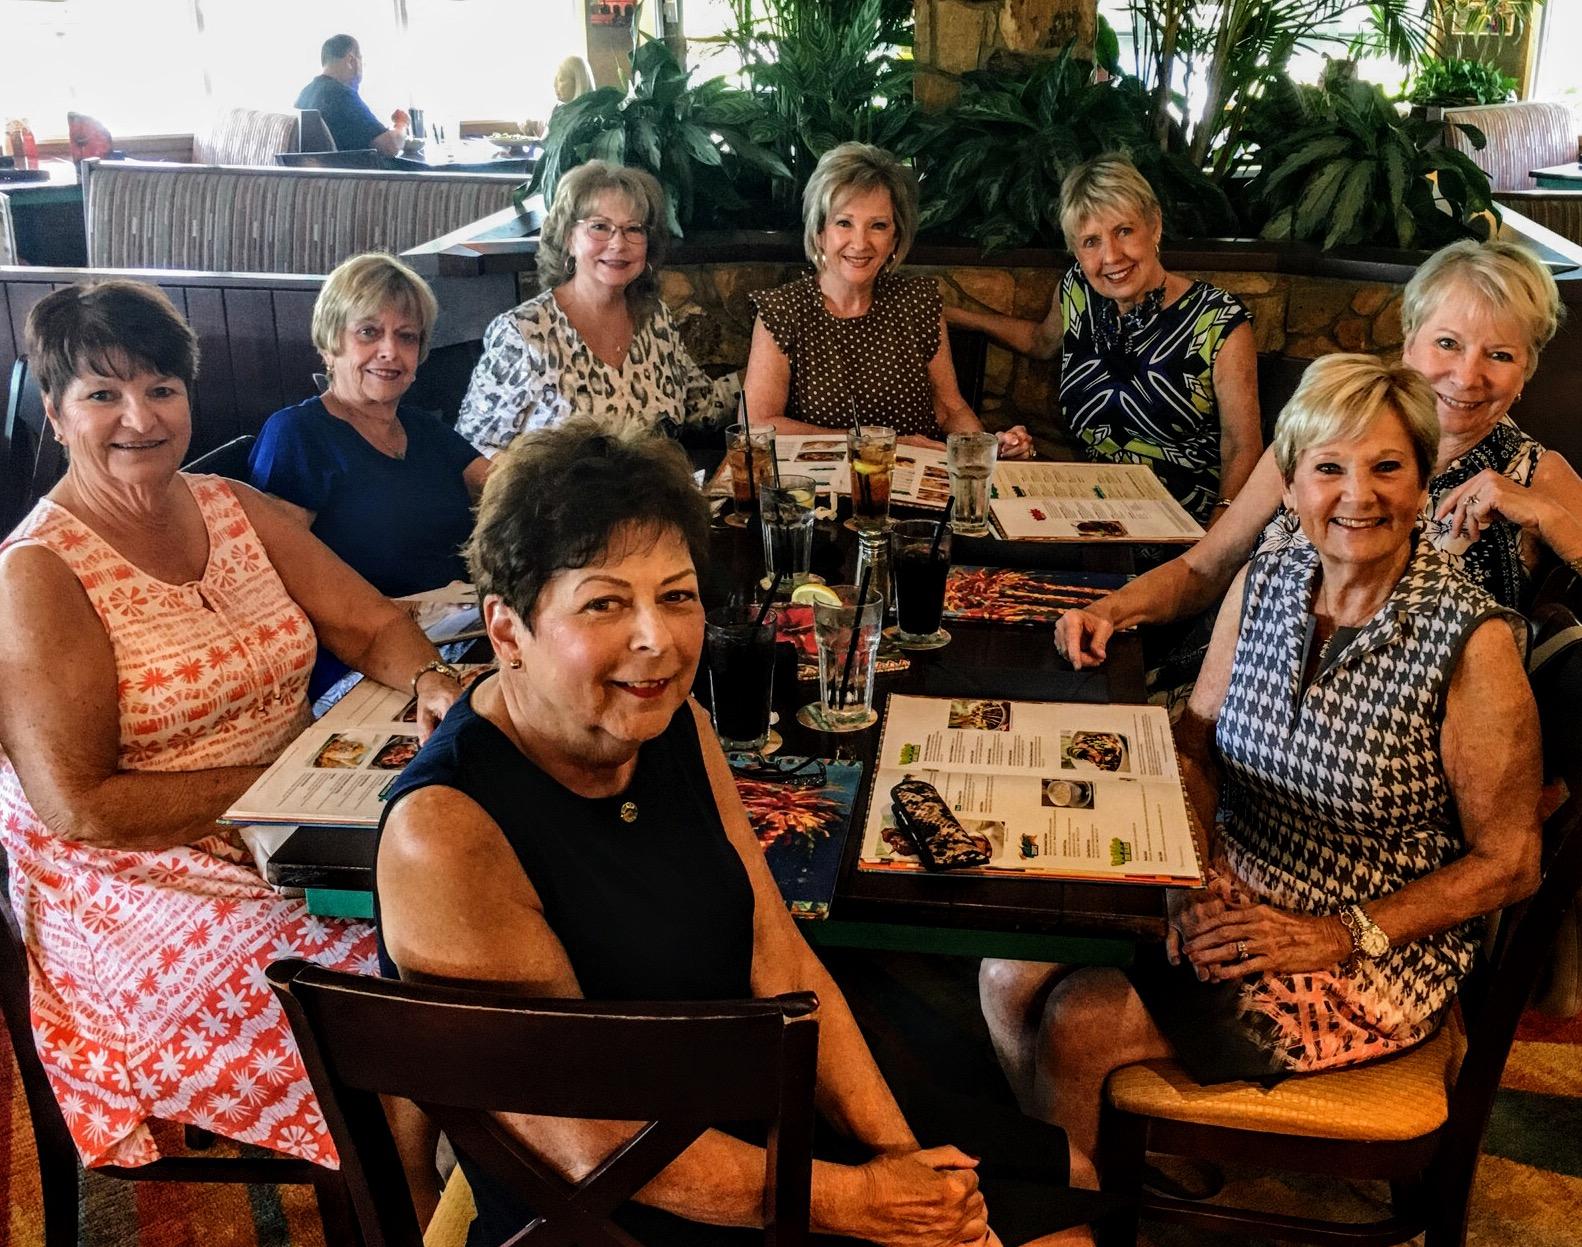 Magnolia Friends: Judy Croft, Donna Galkin, Cathy Scott, Brenda Wallace, Monica Young, Darlene Sullivan , Linda Burnett and Joyce Ferranti